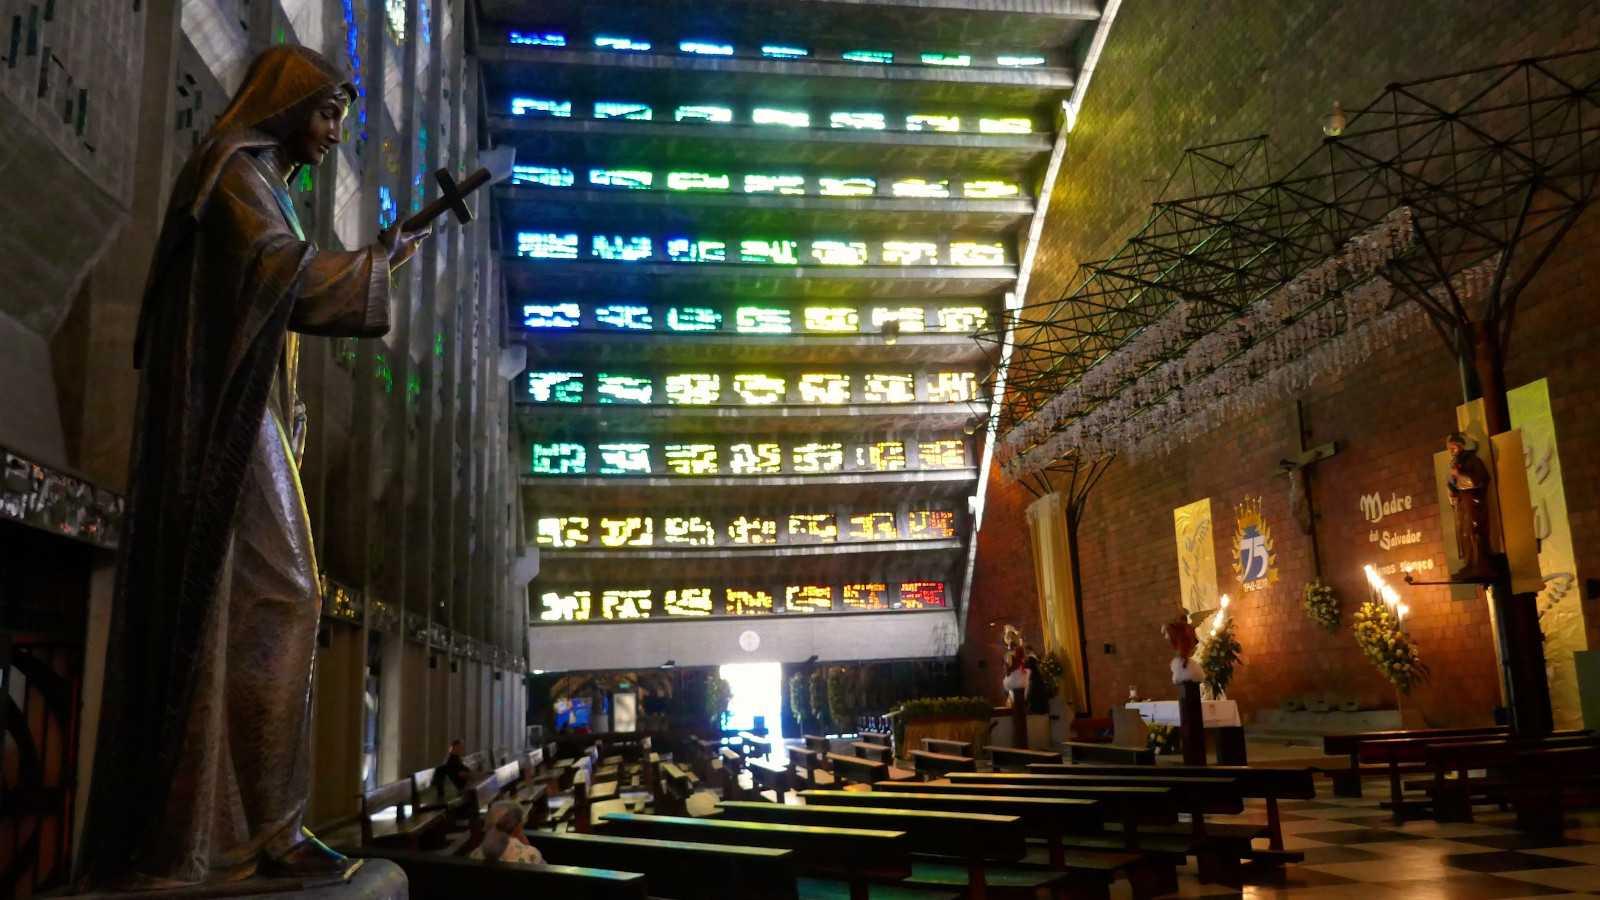 El Rosario church one of best things to do in layover in El Salvador